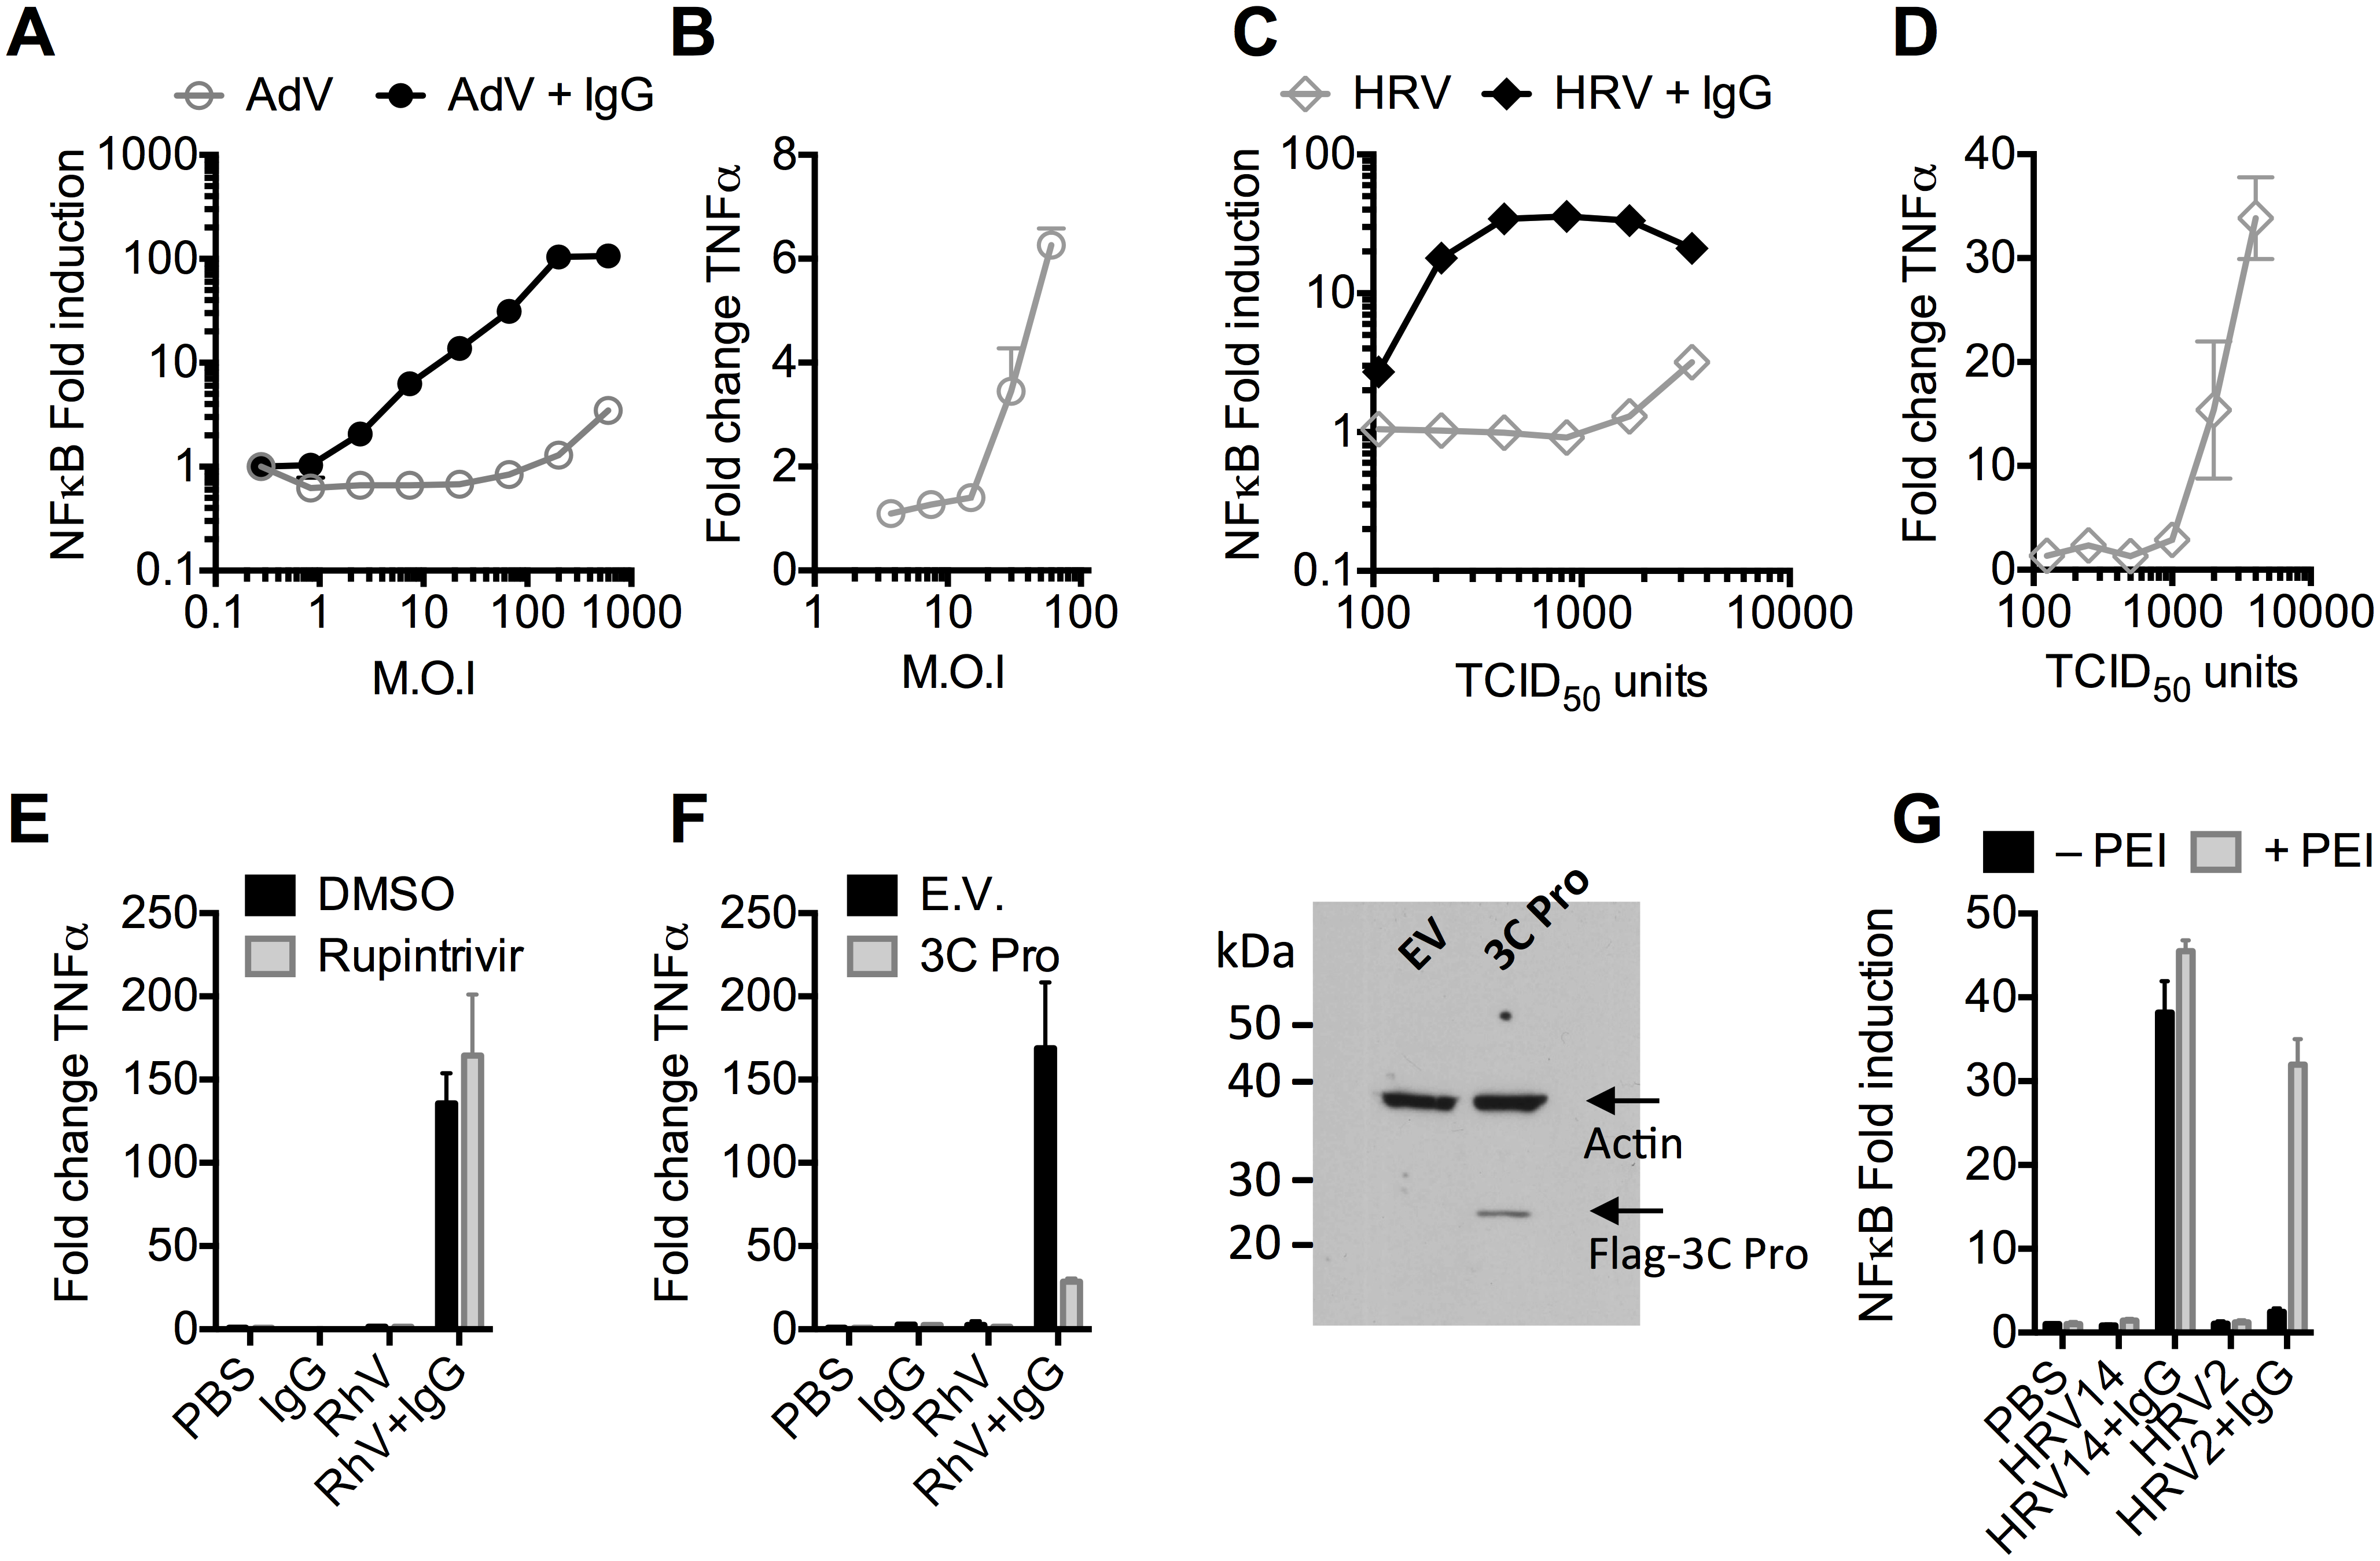 Antibodies potentiate immune sensing during adenovirus (AdV) or rhinovirus (HRV) infection.